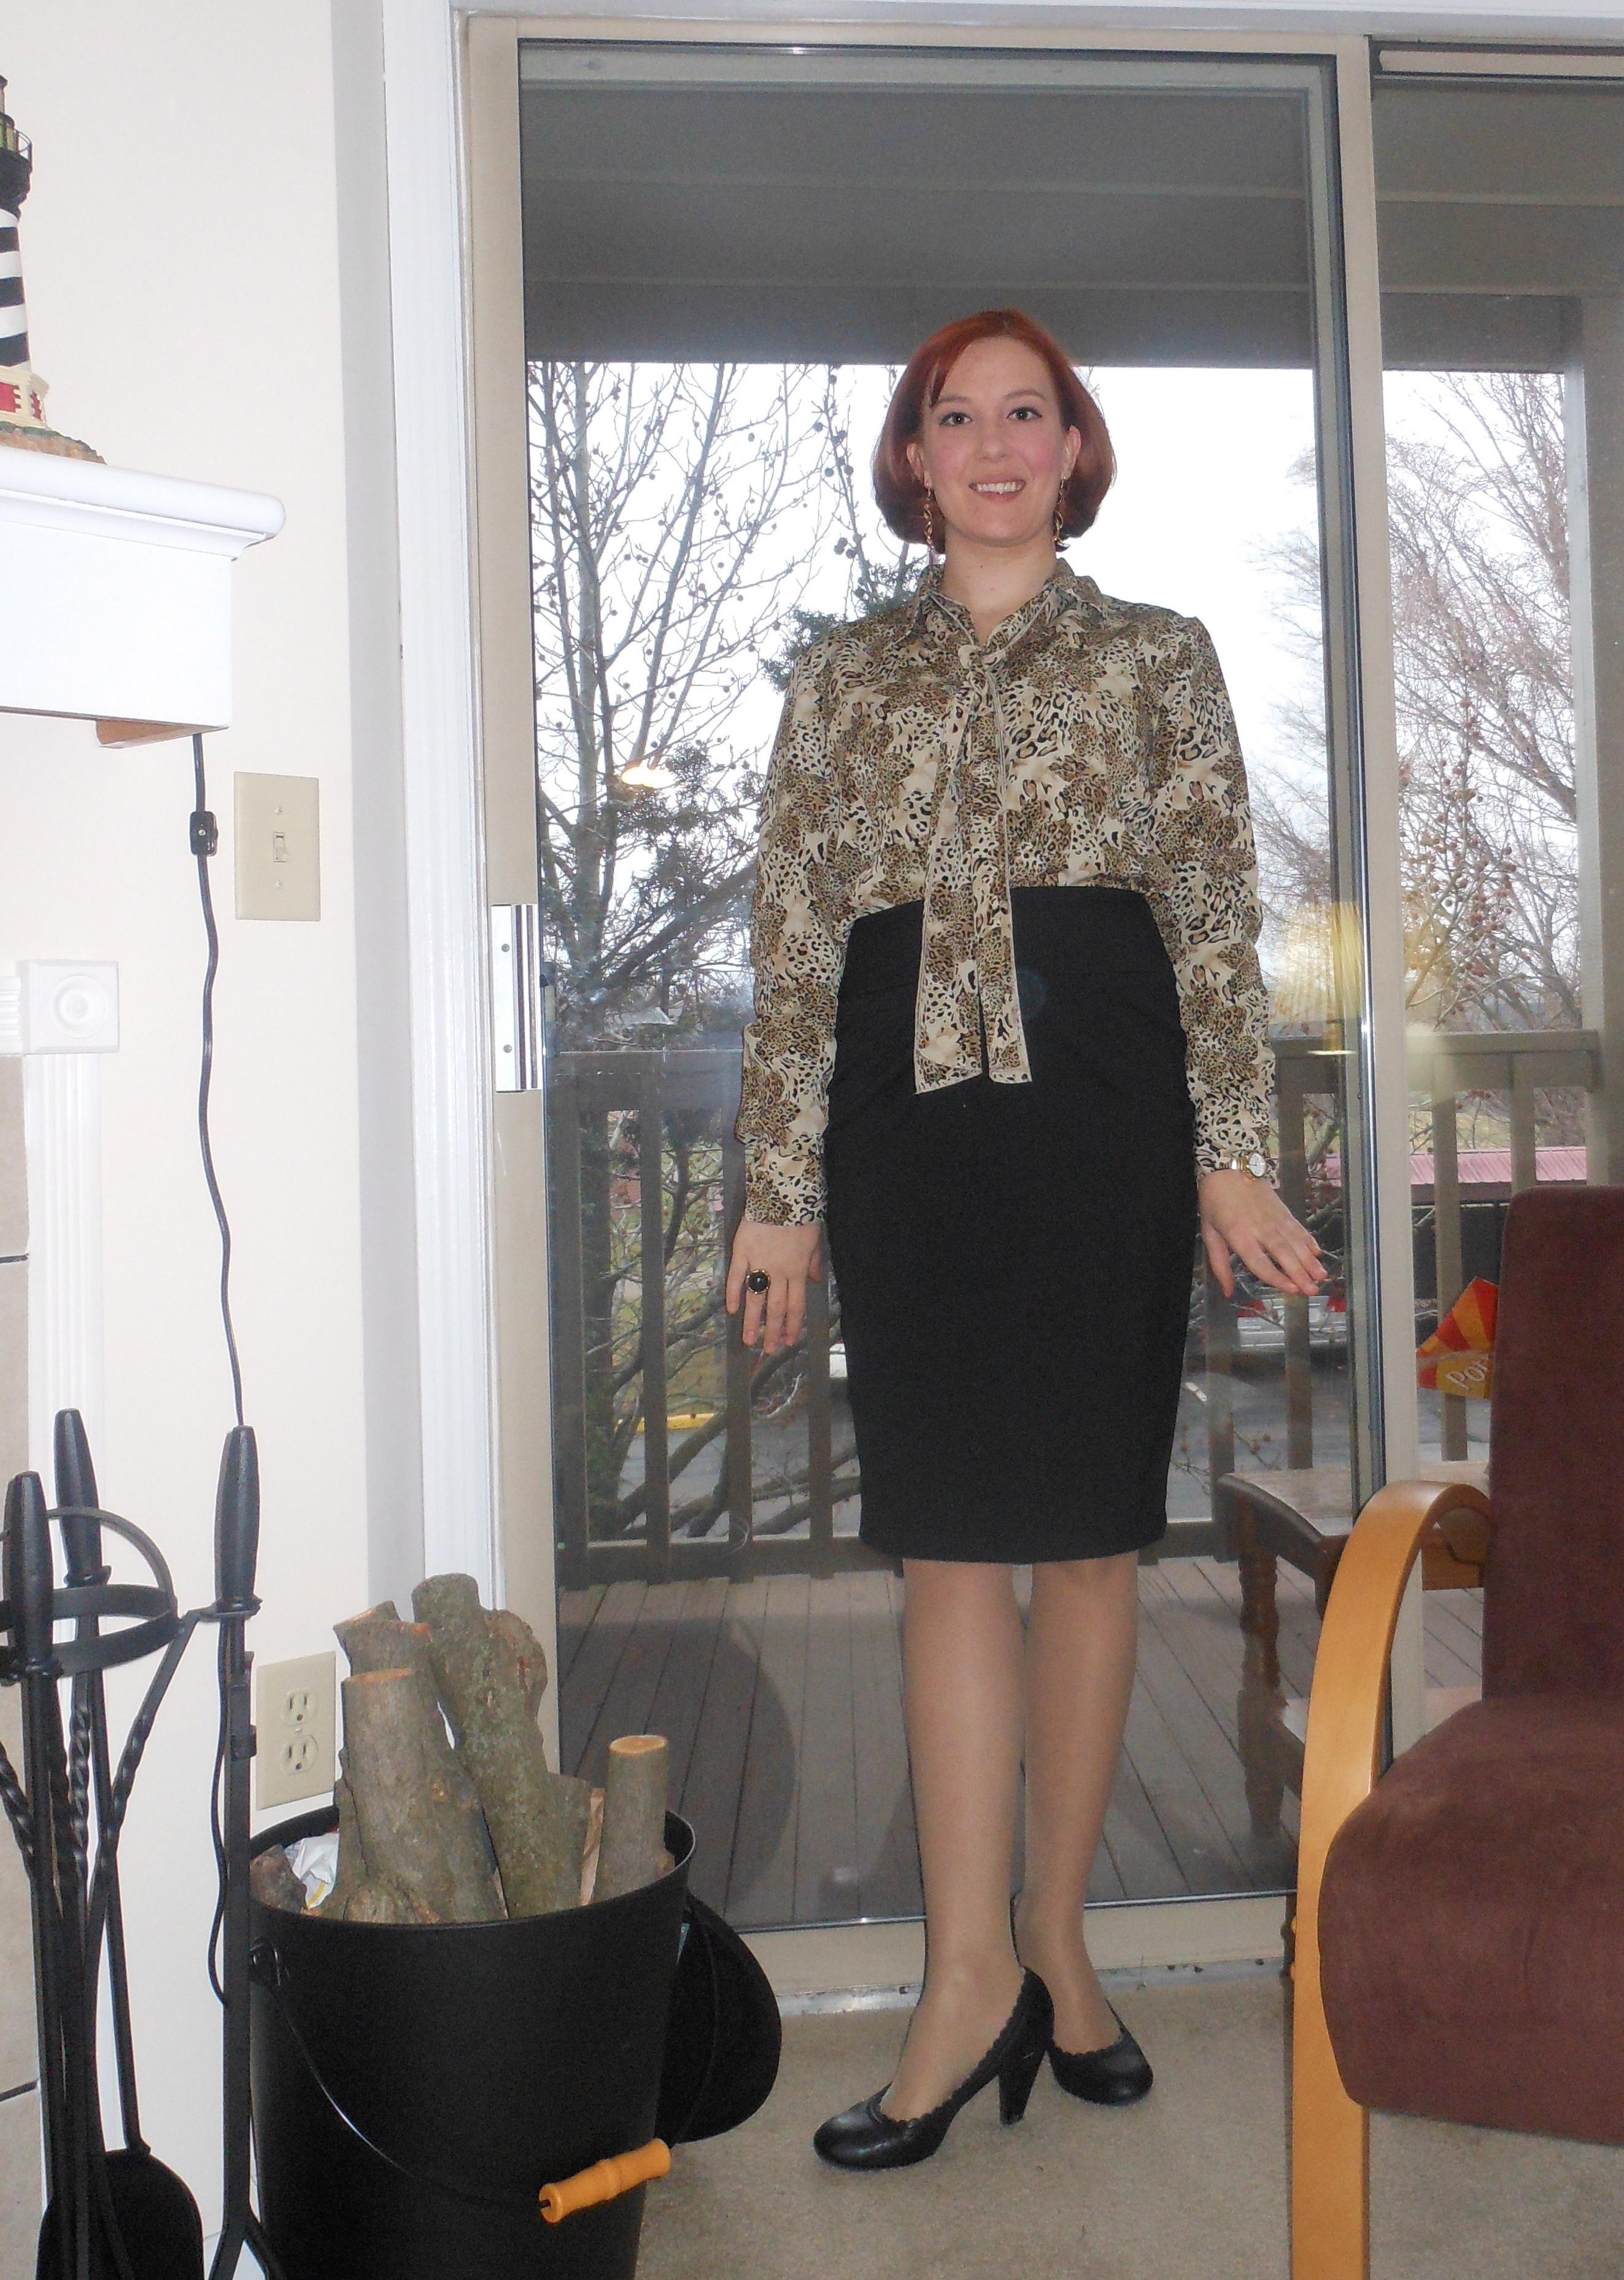 Teach in Style Little Black Dress and Lace Skirt - Teach